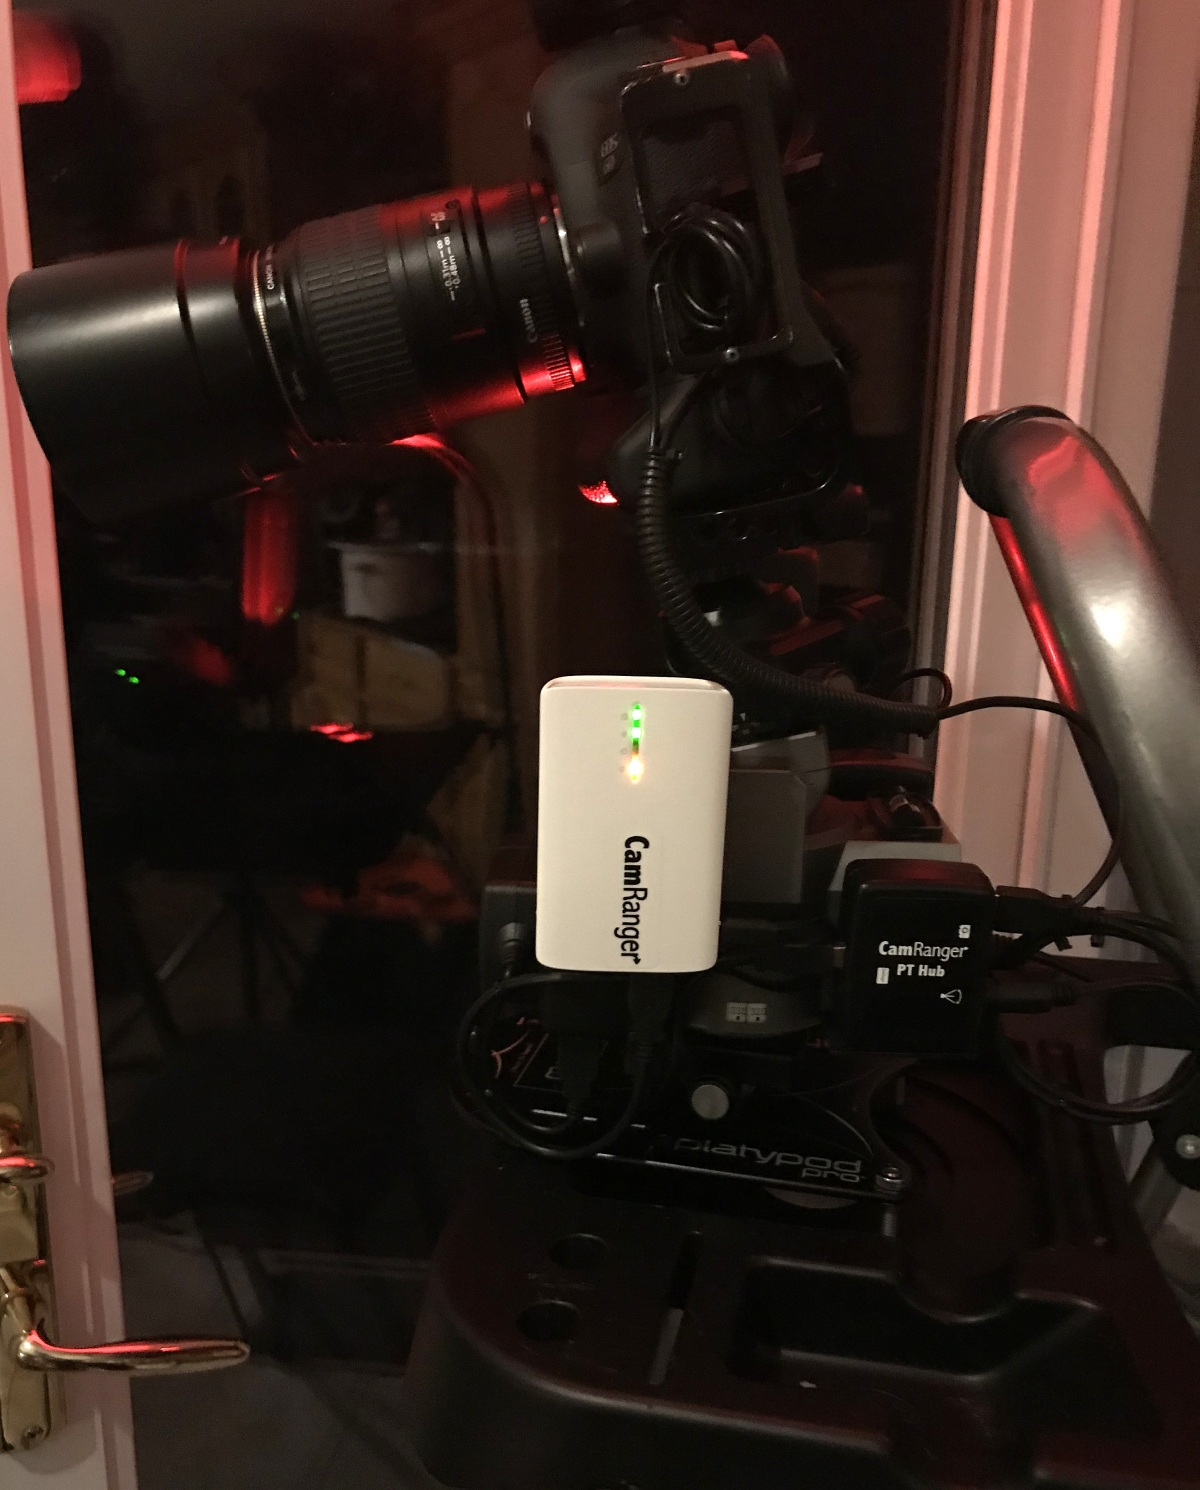 DIY [Camera Gear/Kit] ~ Camera Stand for CamRanger, PT Hub, & MP-360 Pan/Tilt Head on a Platypod Pro Max,09/18